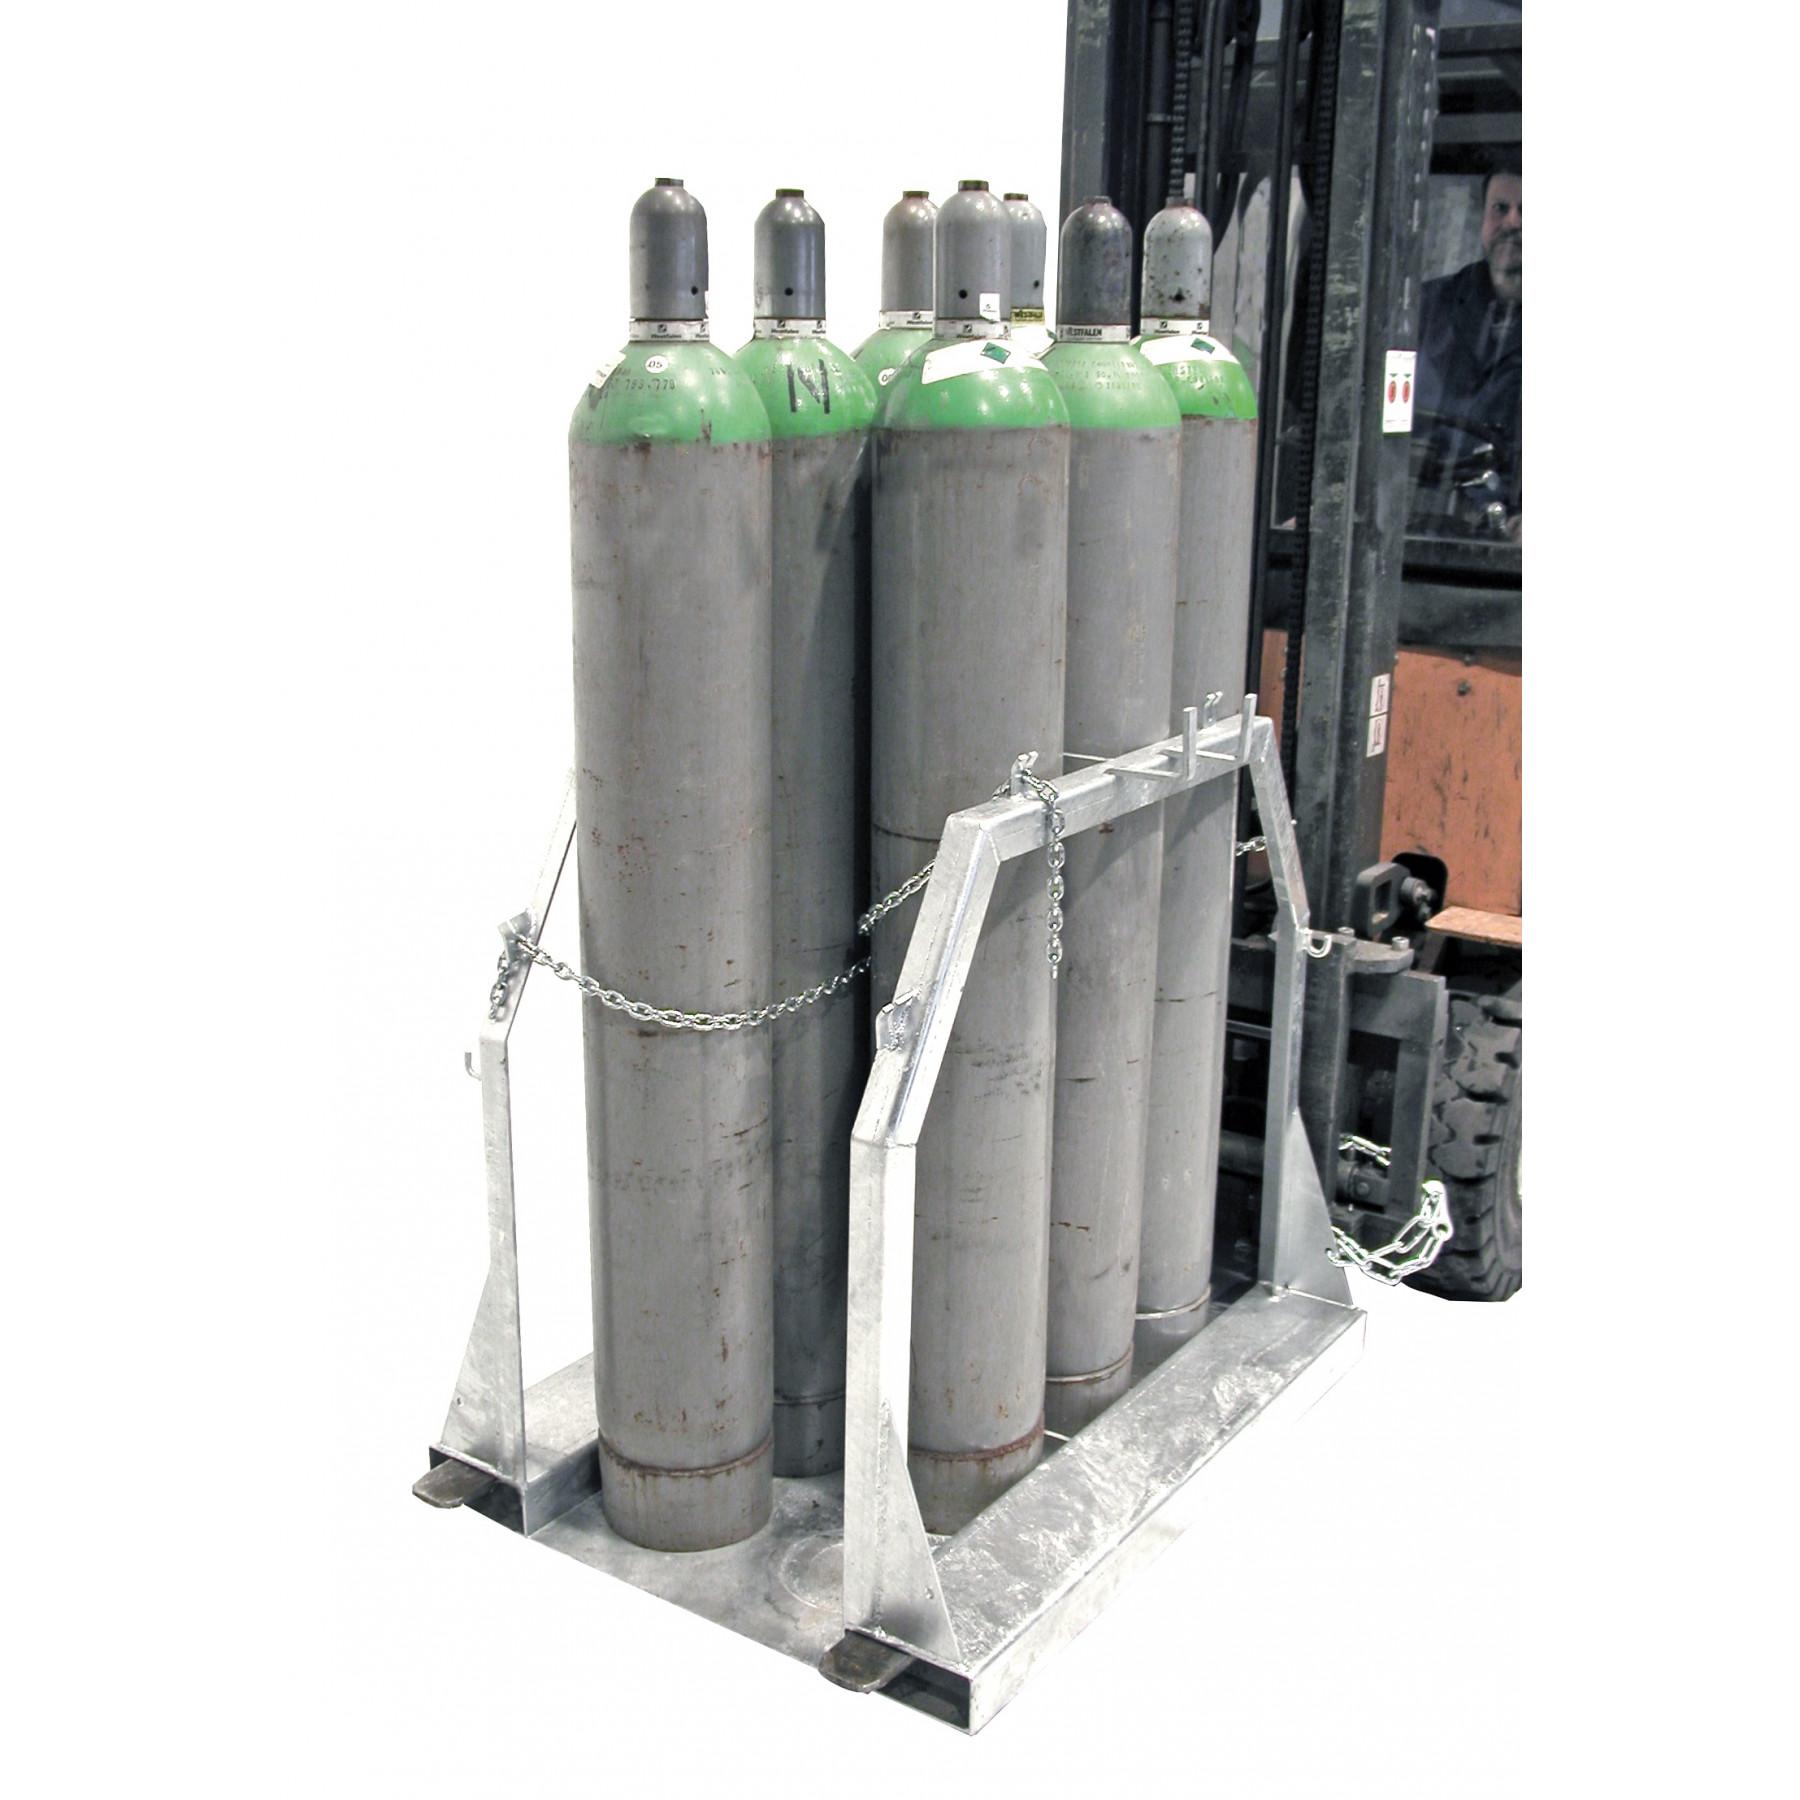 Gasflessenpallet voor 1-8 gasflessen, 70049-SFP8